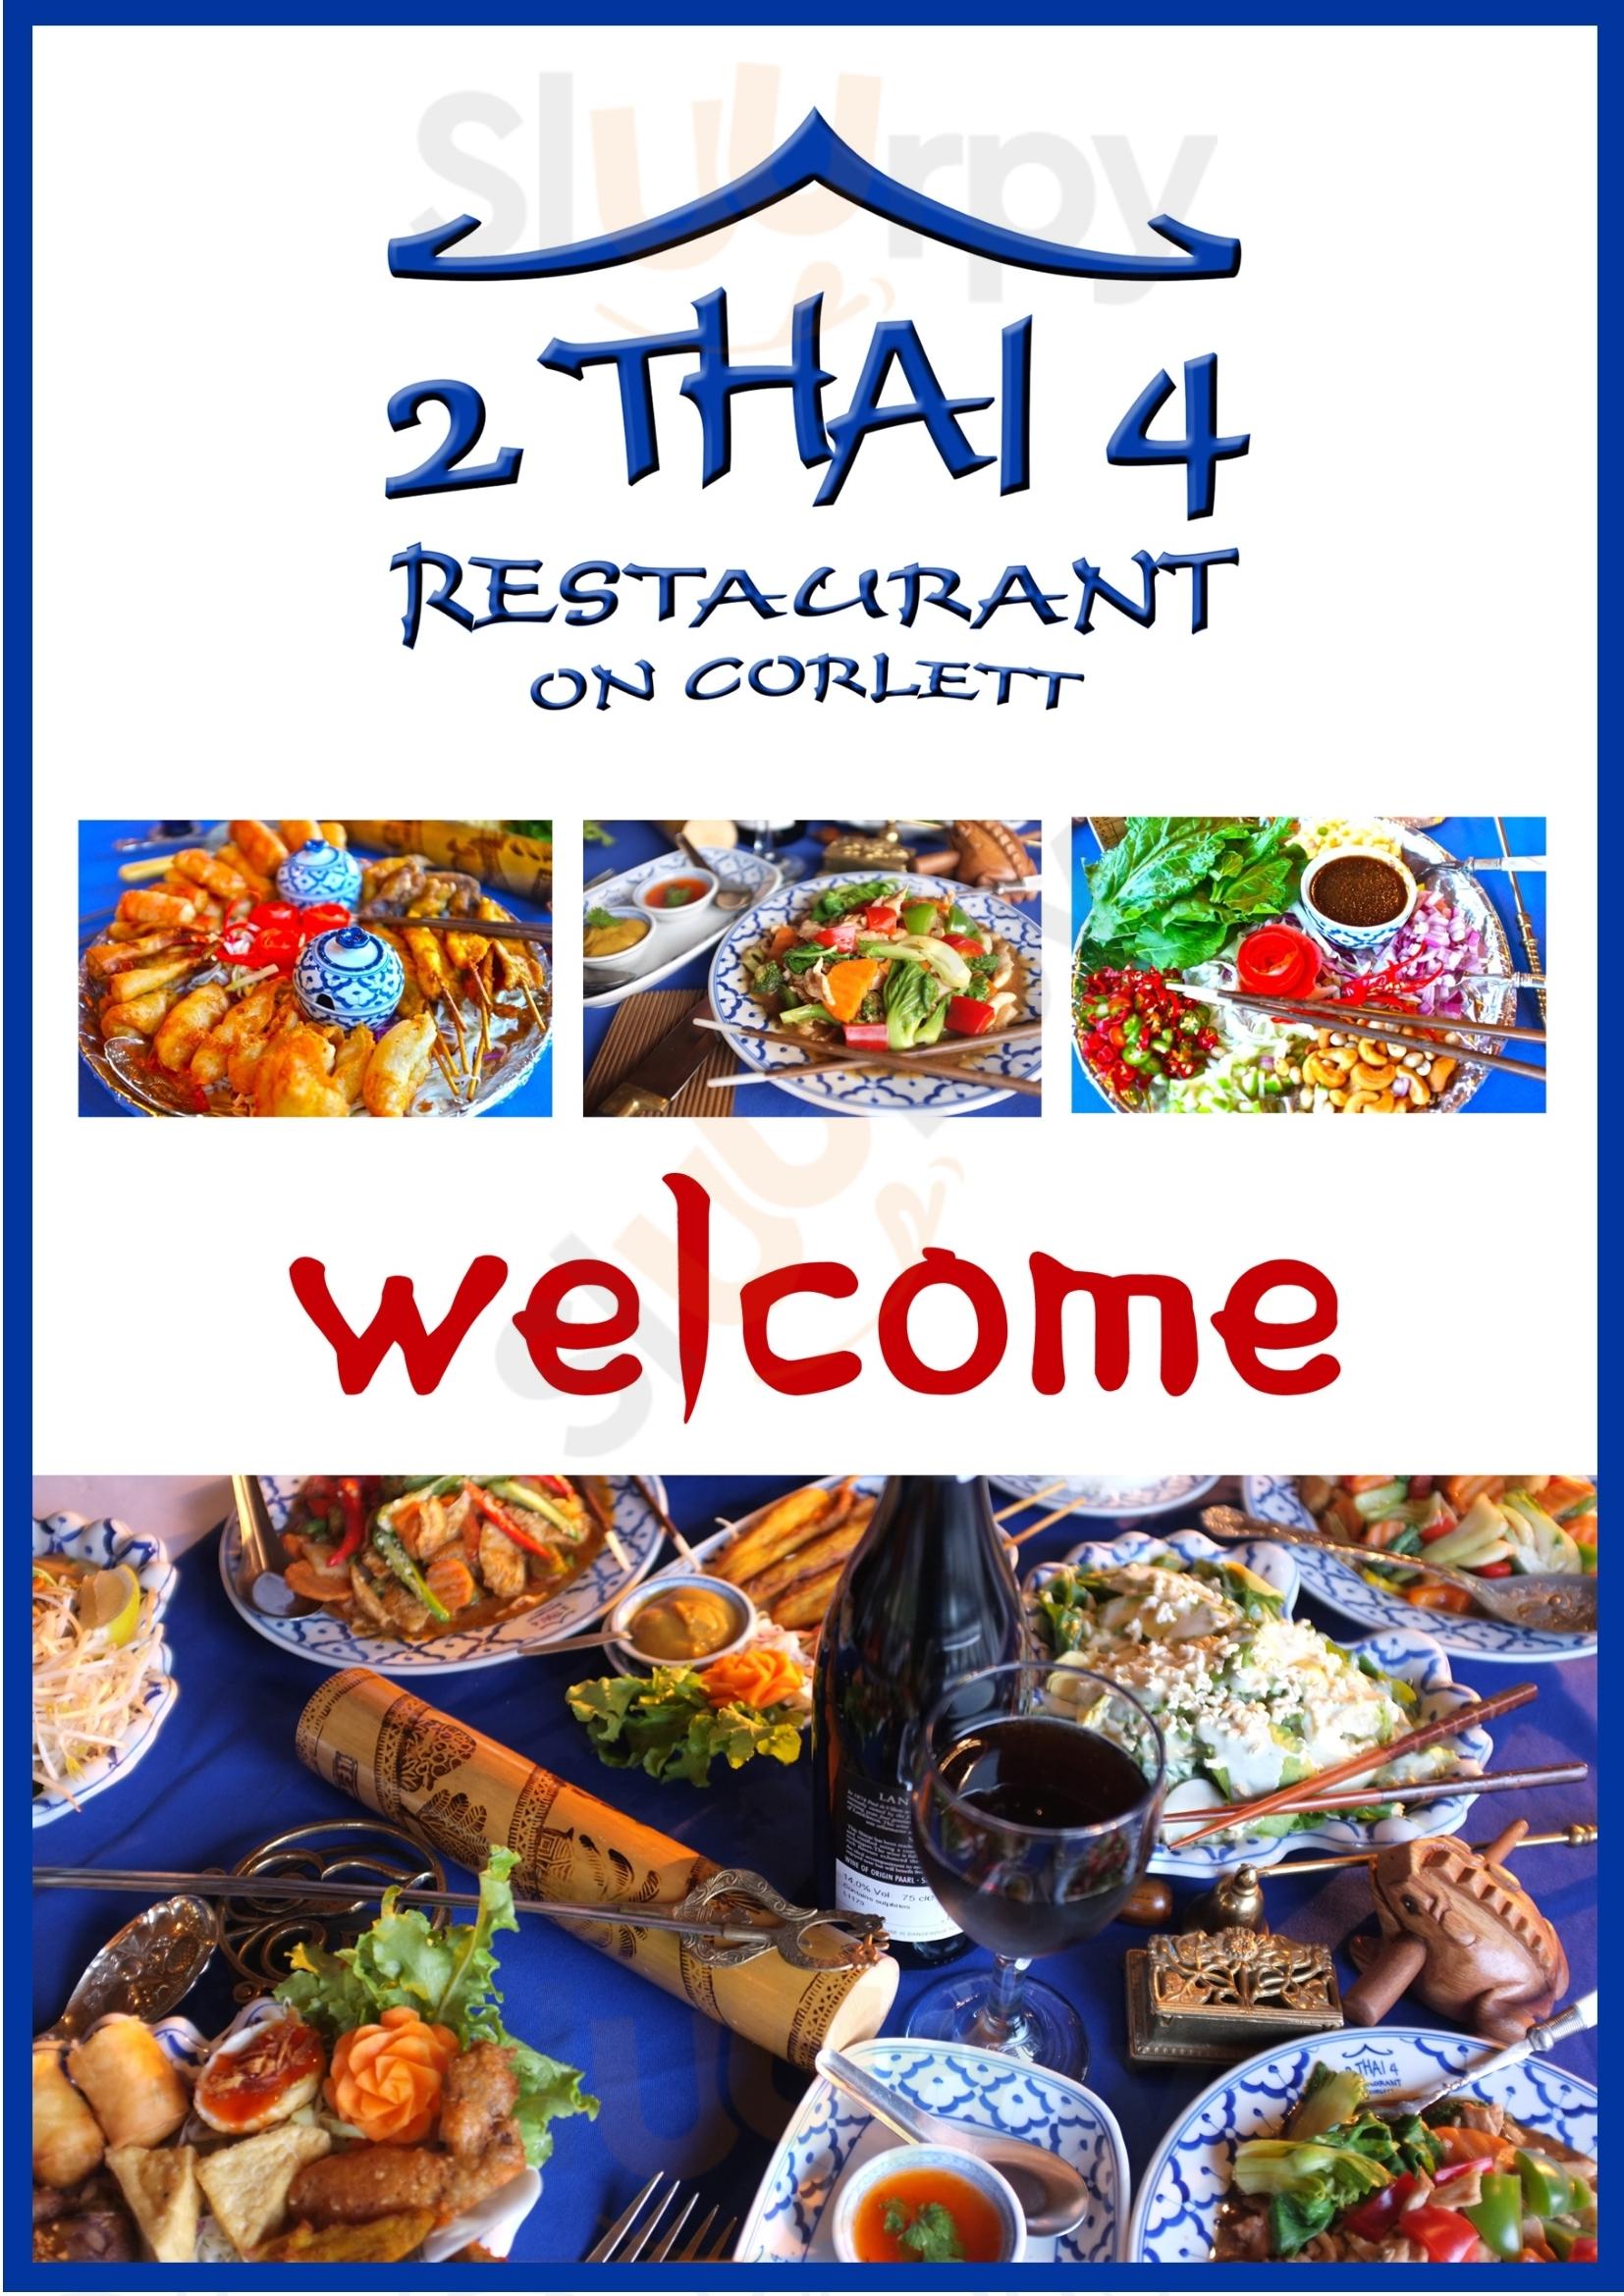 2 Thai 4 Restaurant Johannesburg menù - pagina 1